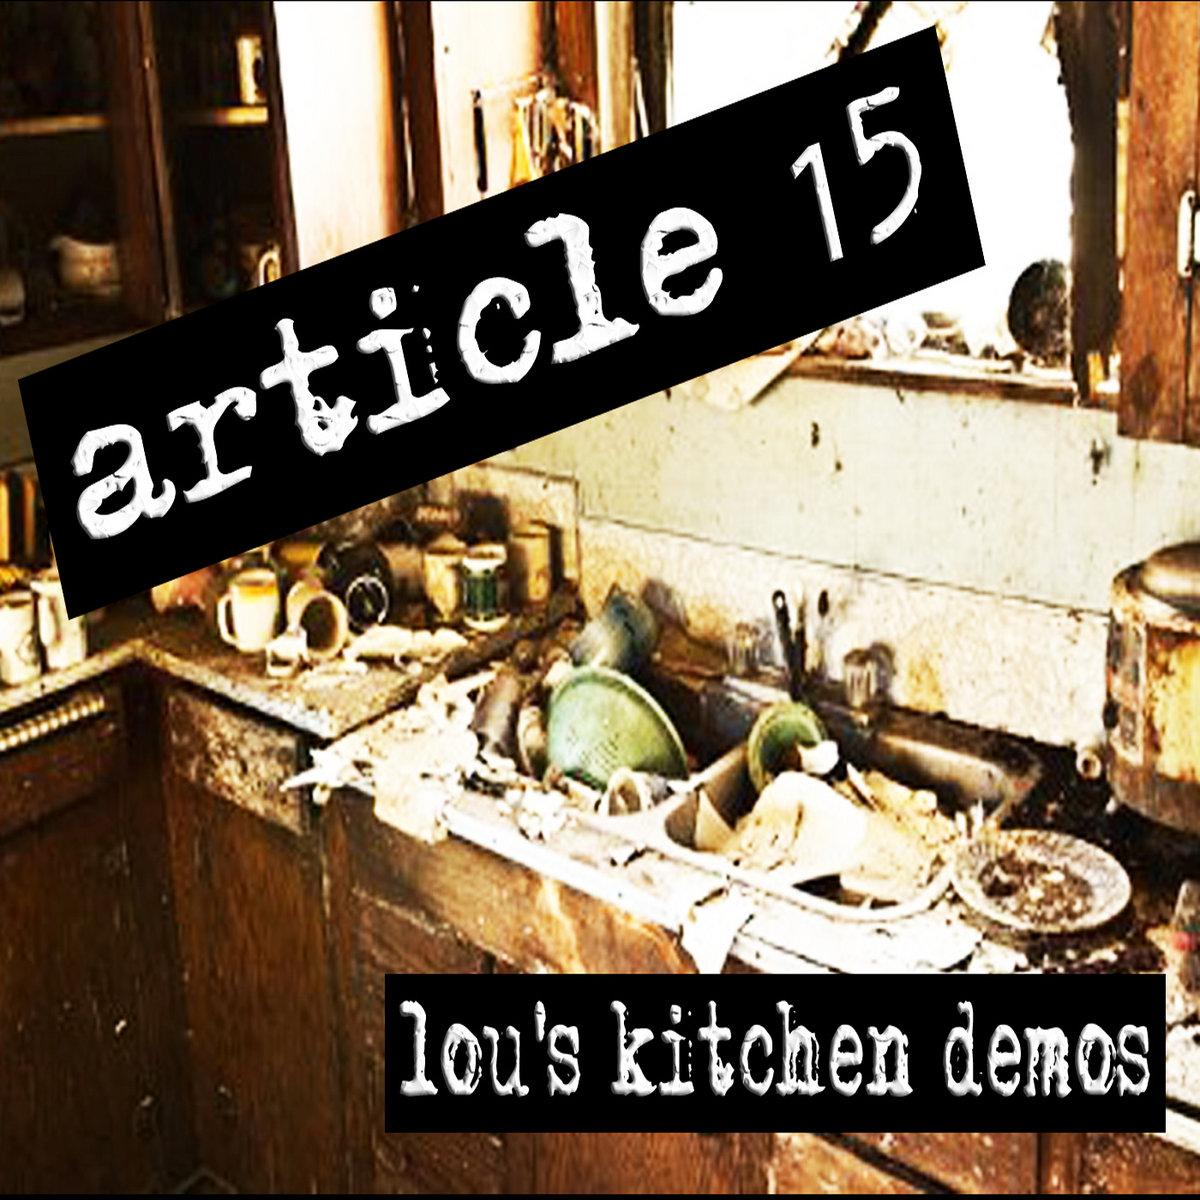 Lou's Kitchen Demos   Article 15